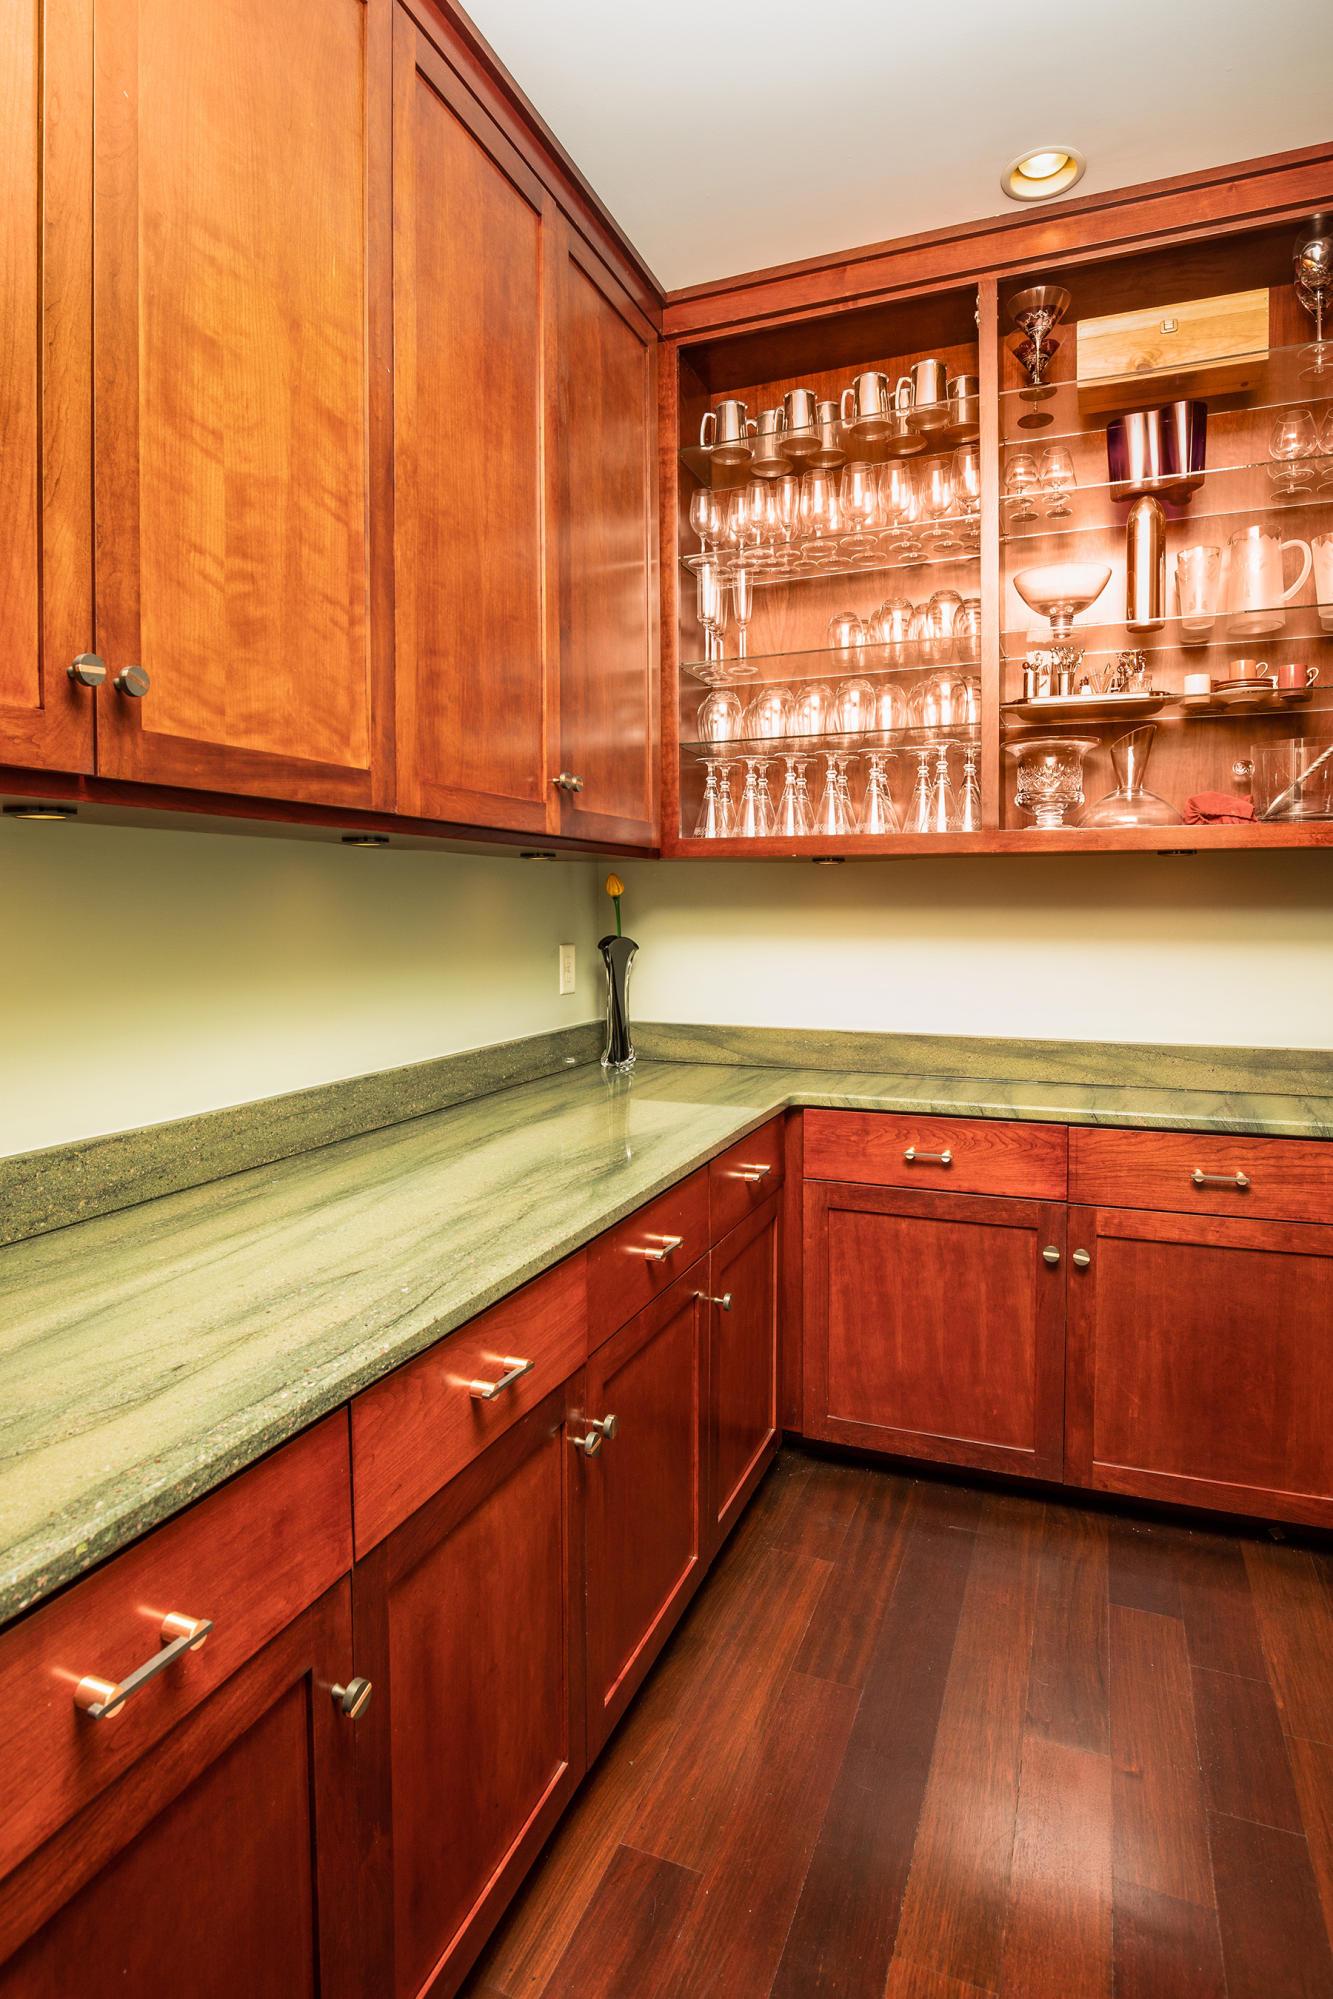 Ellis Oaks Homes For Sale - 672 Ellis Oak, Charleston, SC - 9